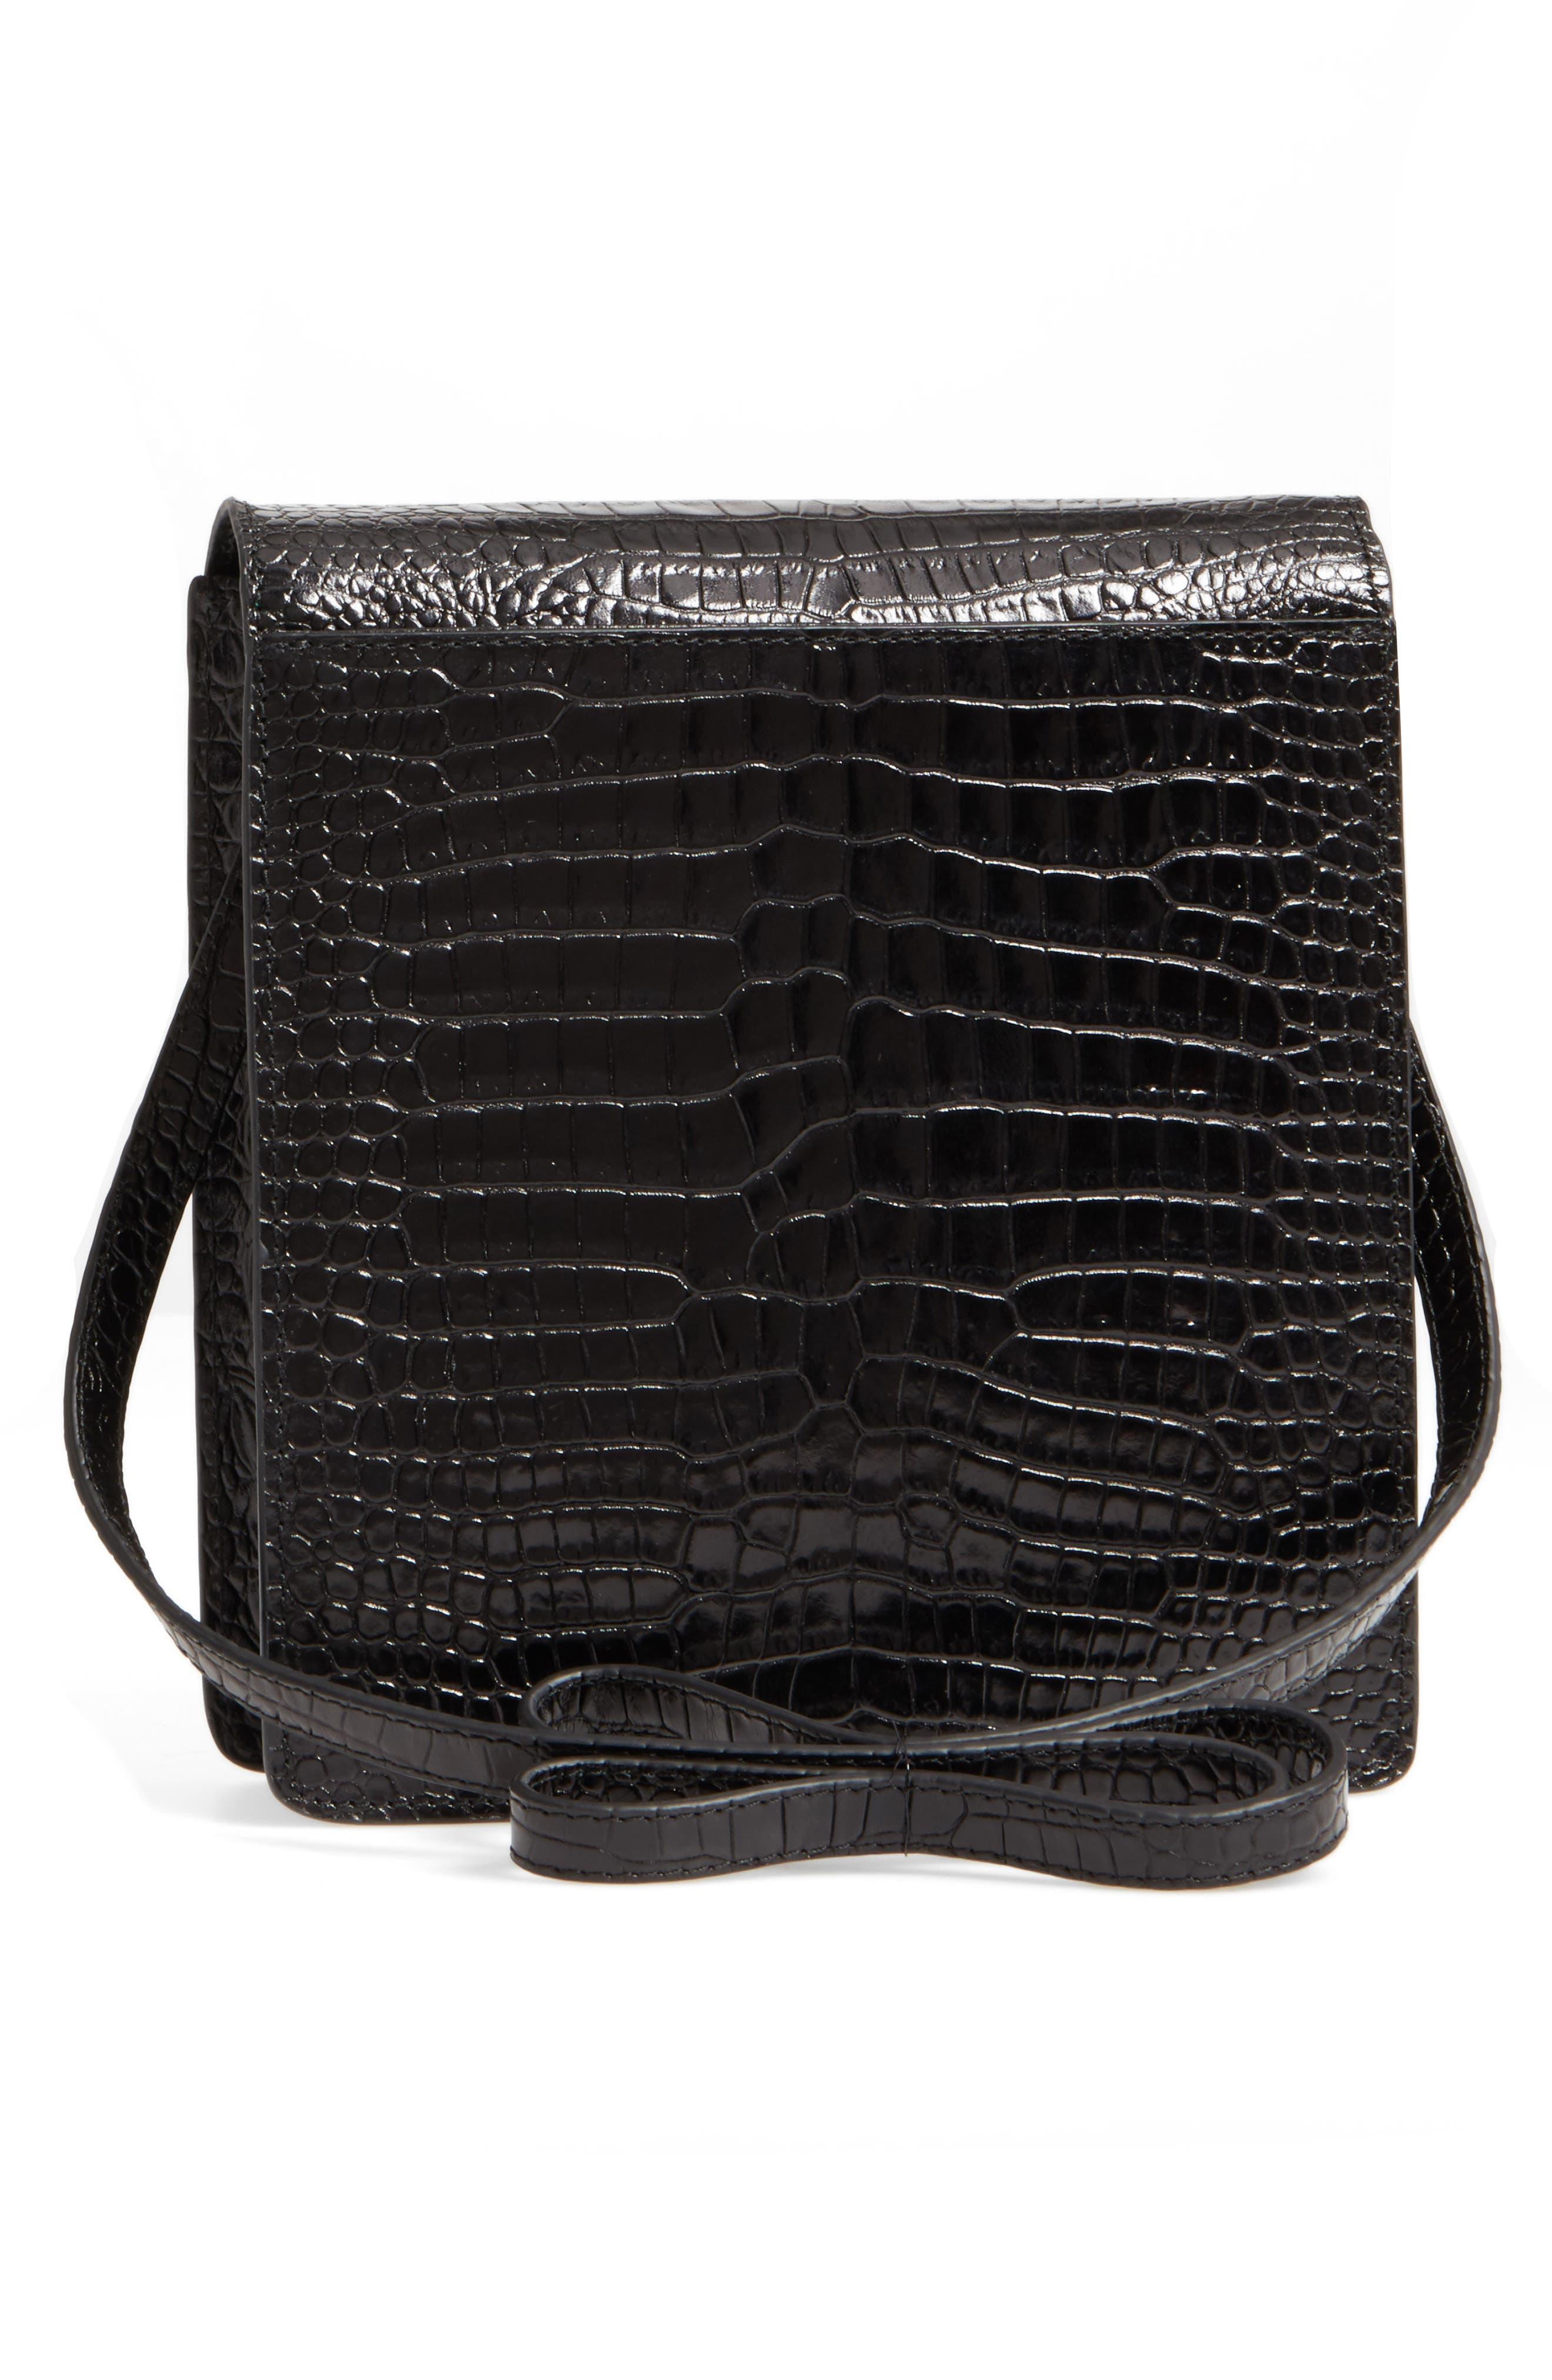 Eloise Leather Crossbody Bag,                             Alternate thumbnail 3, color,                             Black